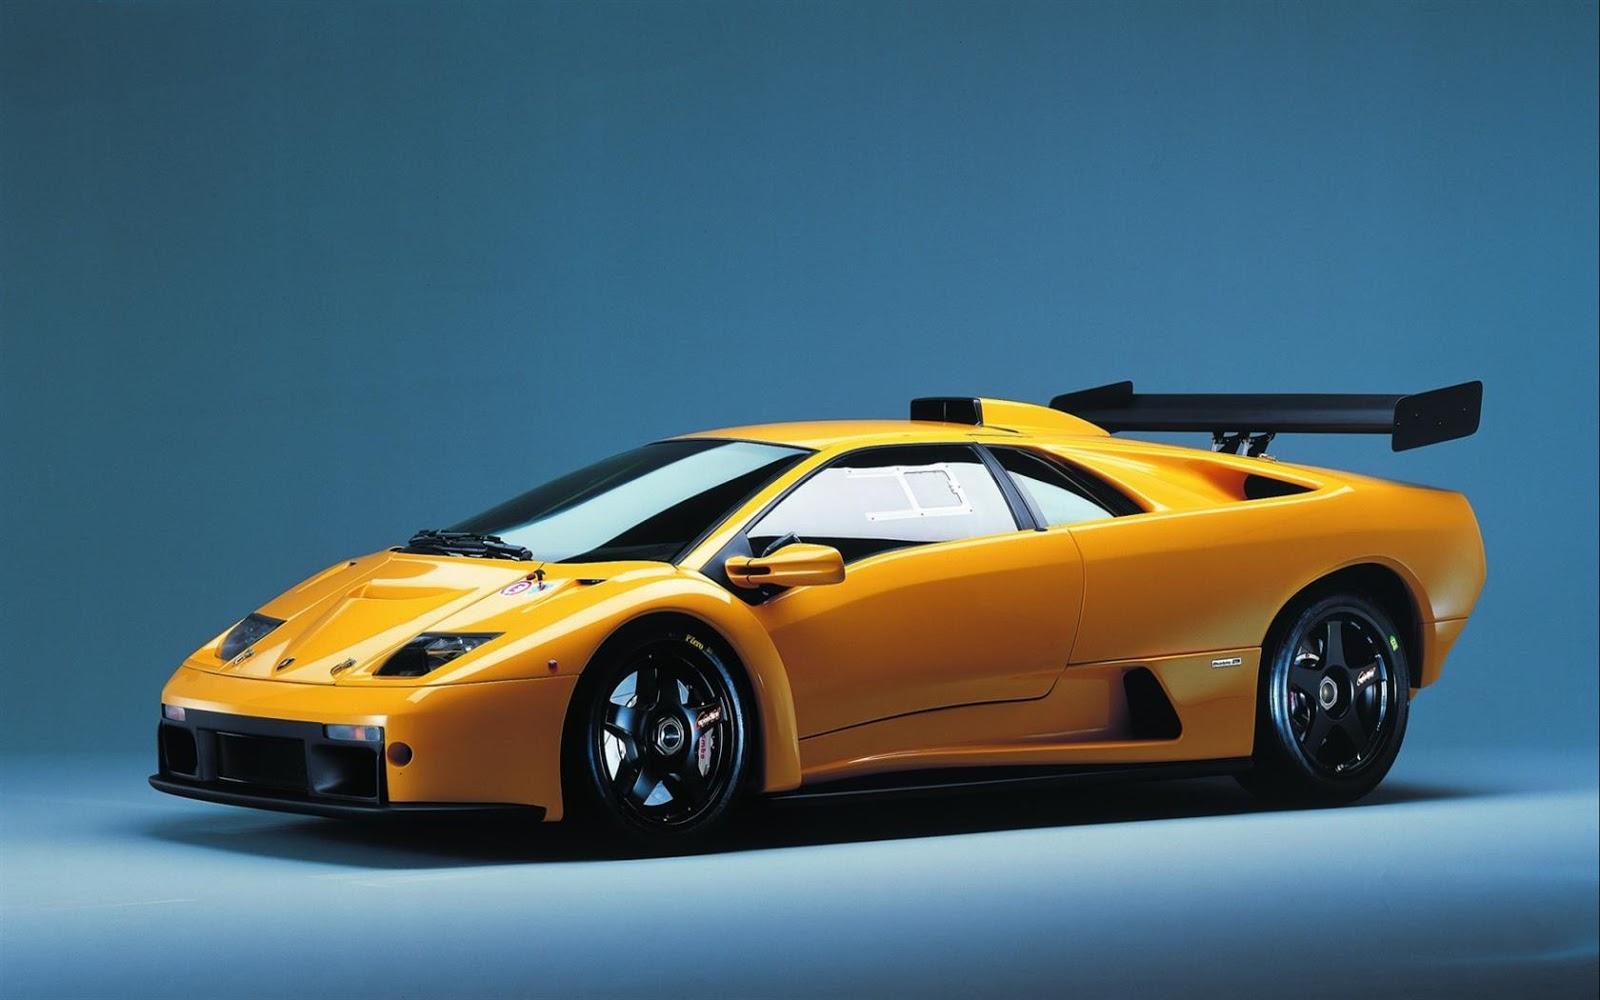 Luxury Lamborghini Cars: Lamborghini Diablo Wallpaper